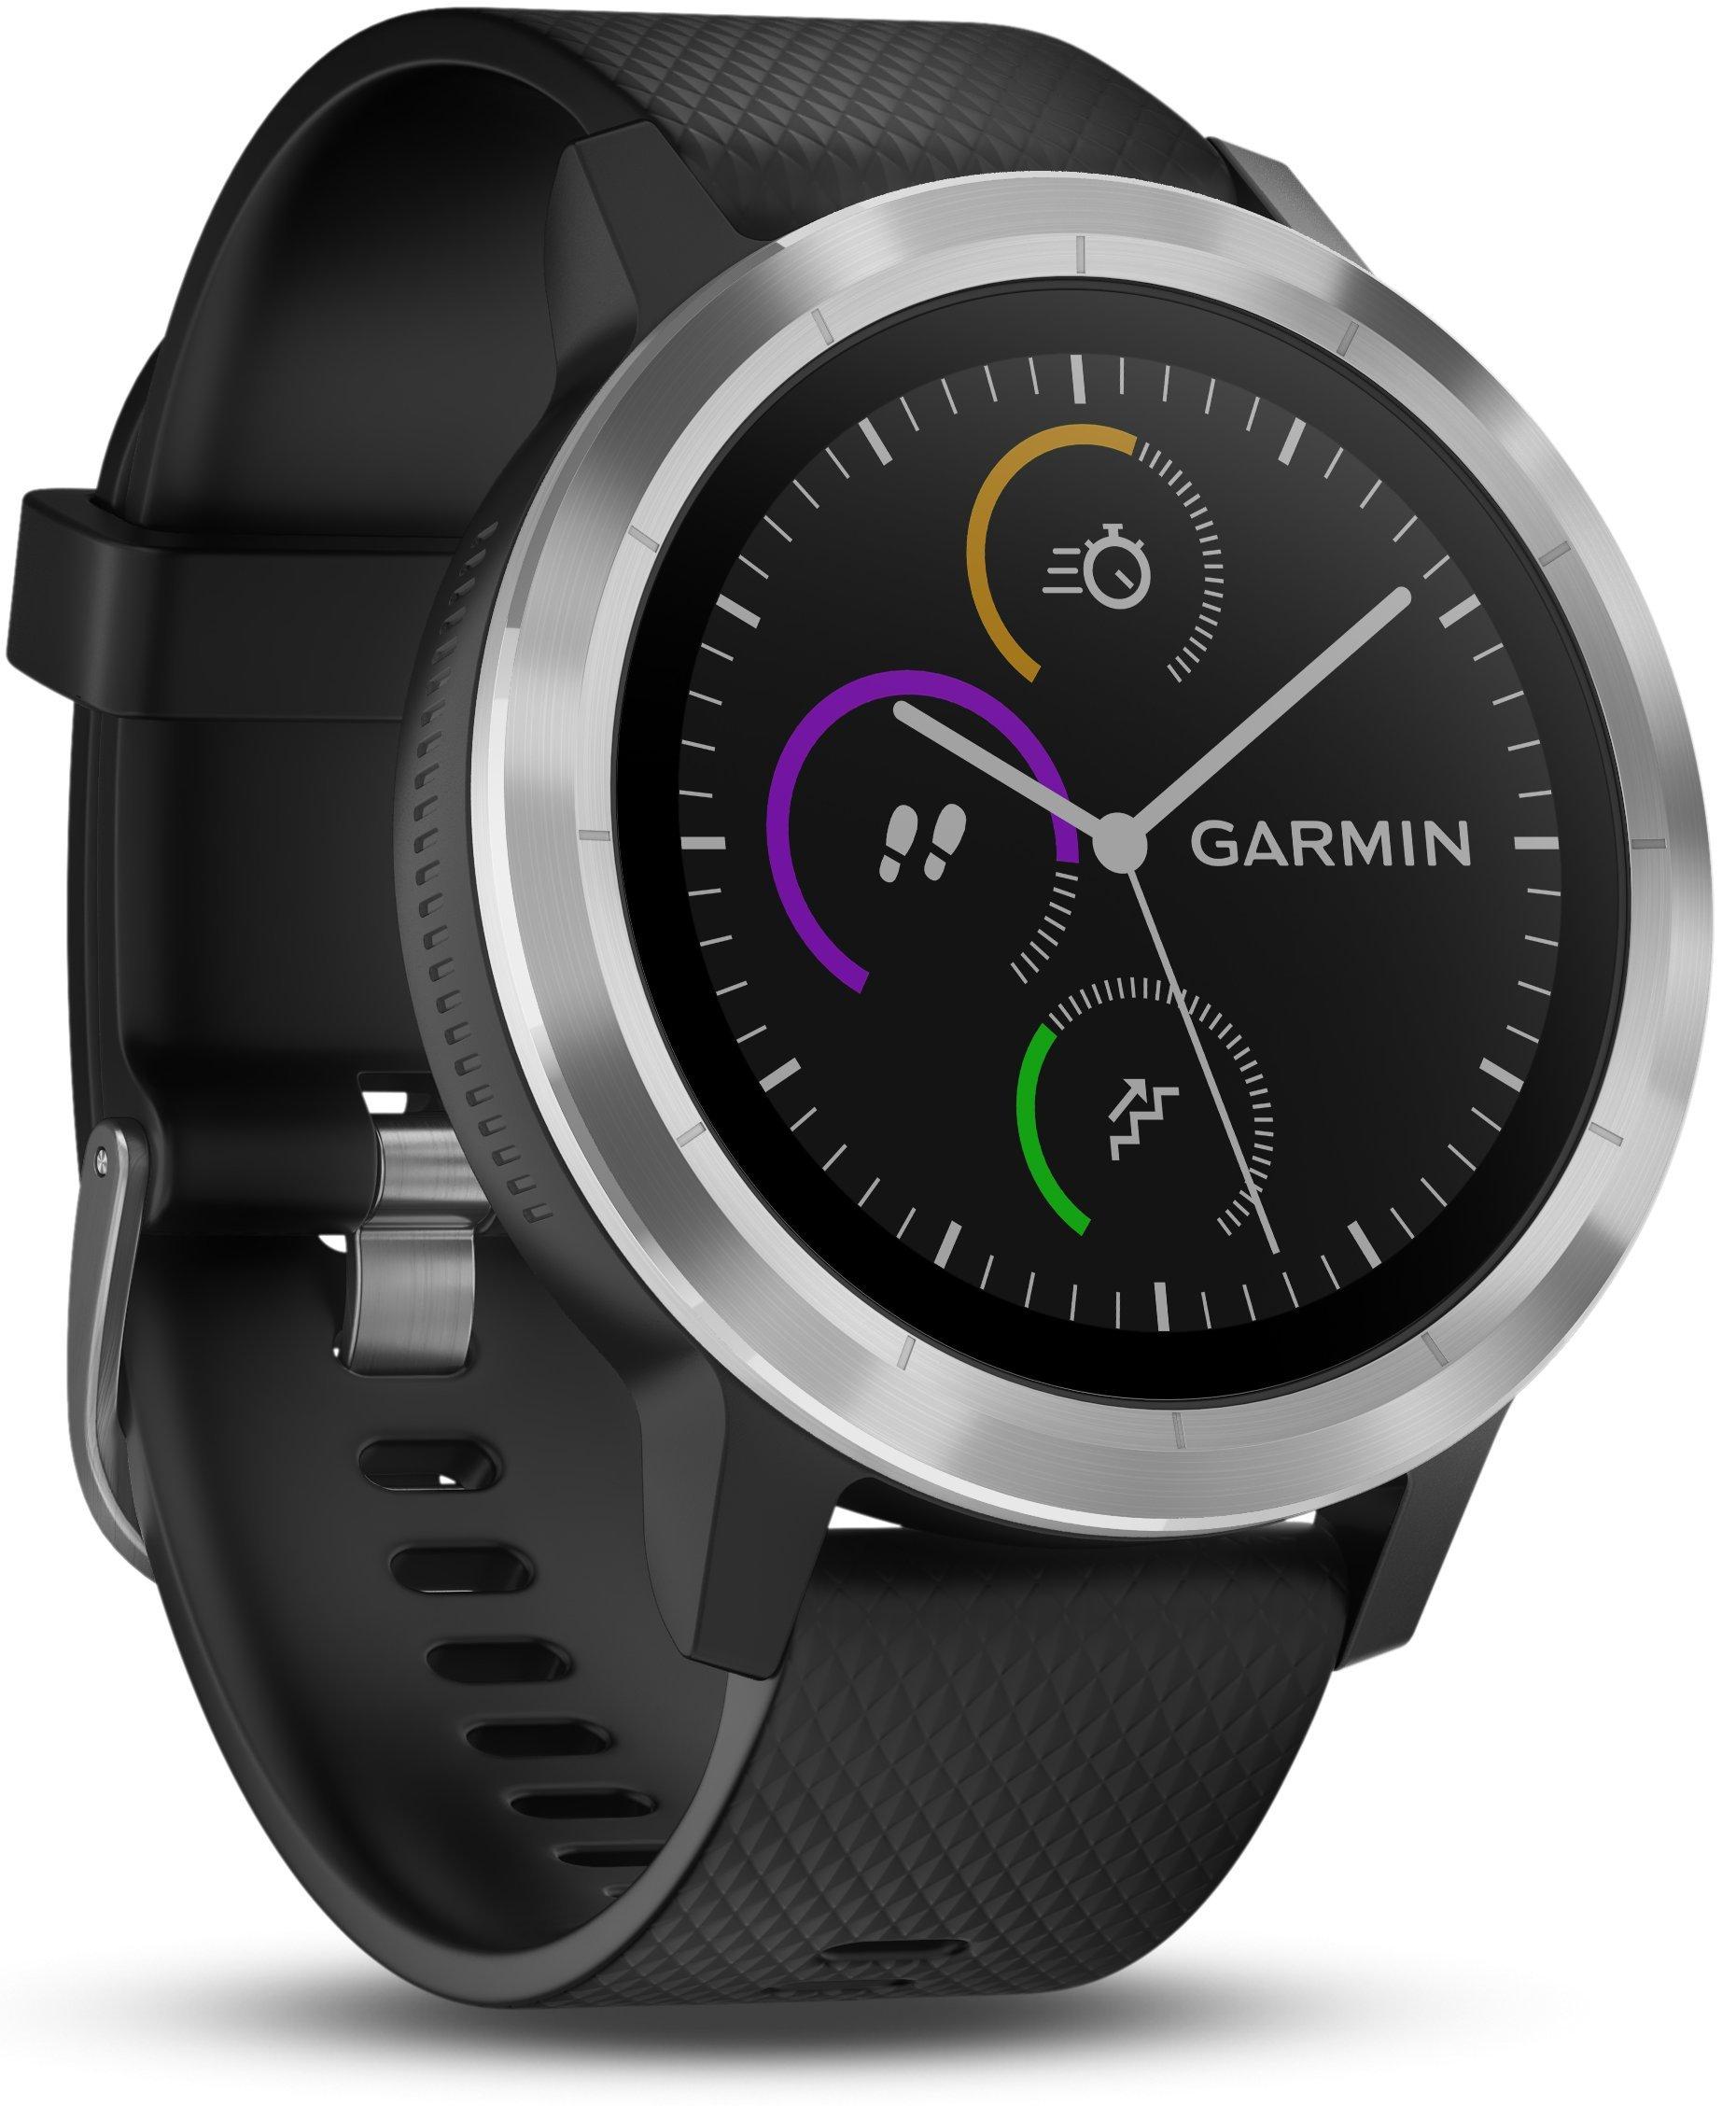 Smartwatch GARMIN Vivoactive 3 1,2'' GPS Waterproof 5 ATM Glonass Black Stainless Steel by Garmin